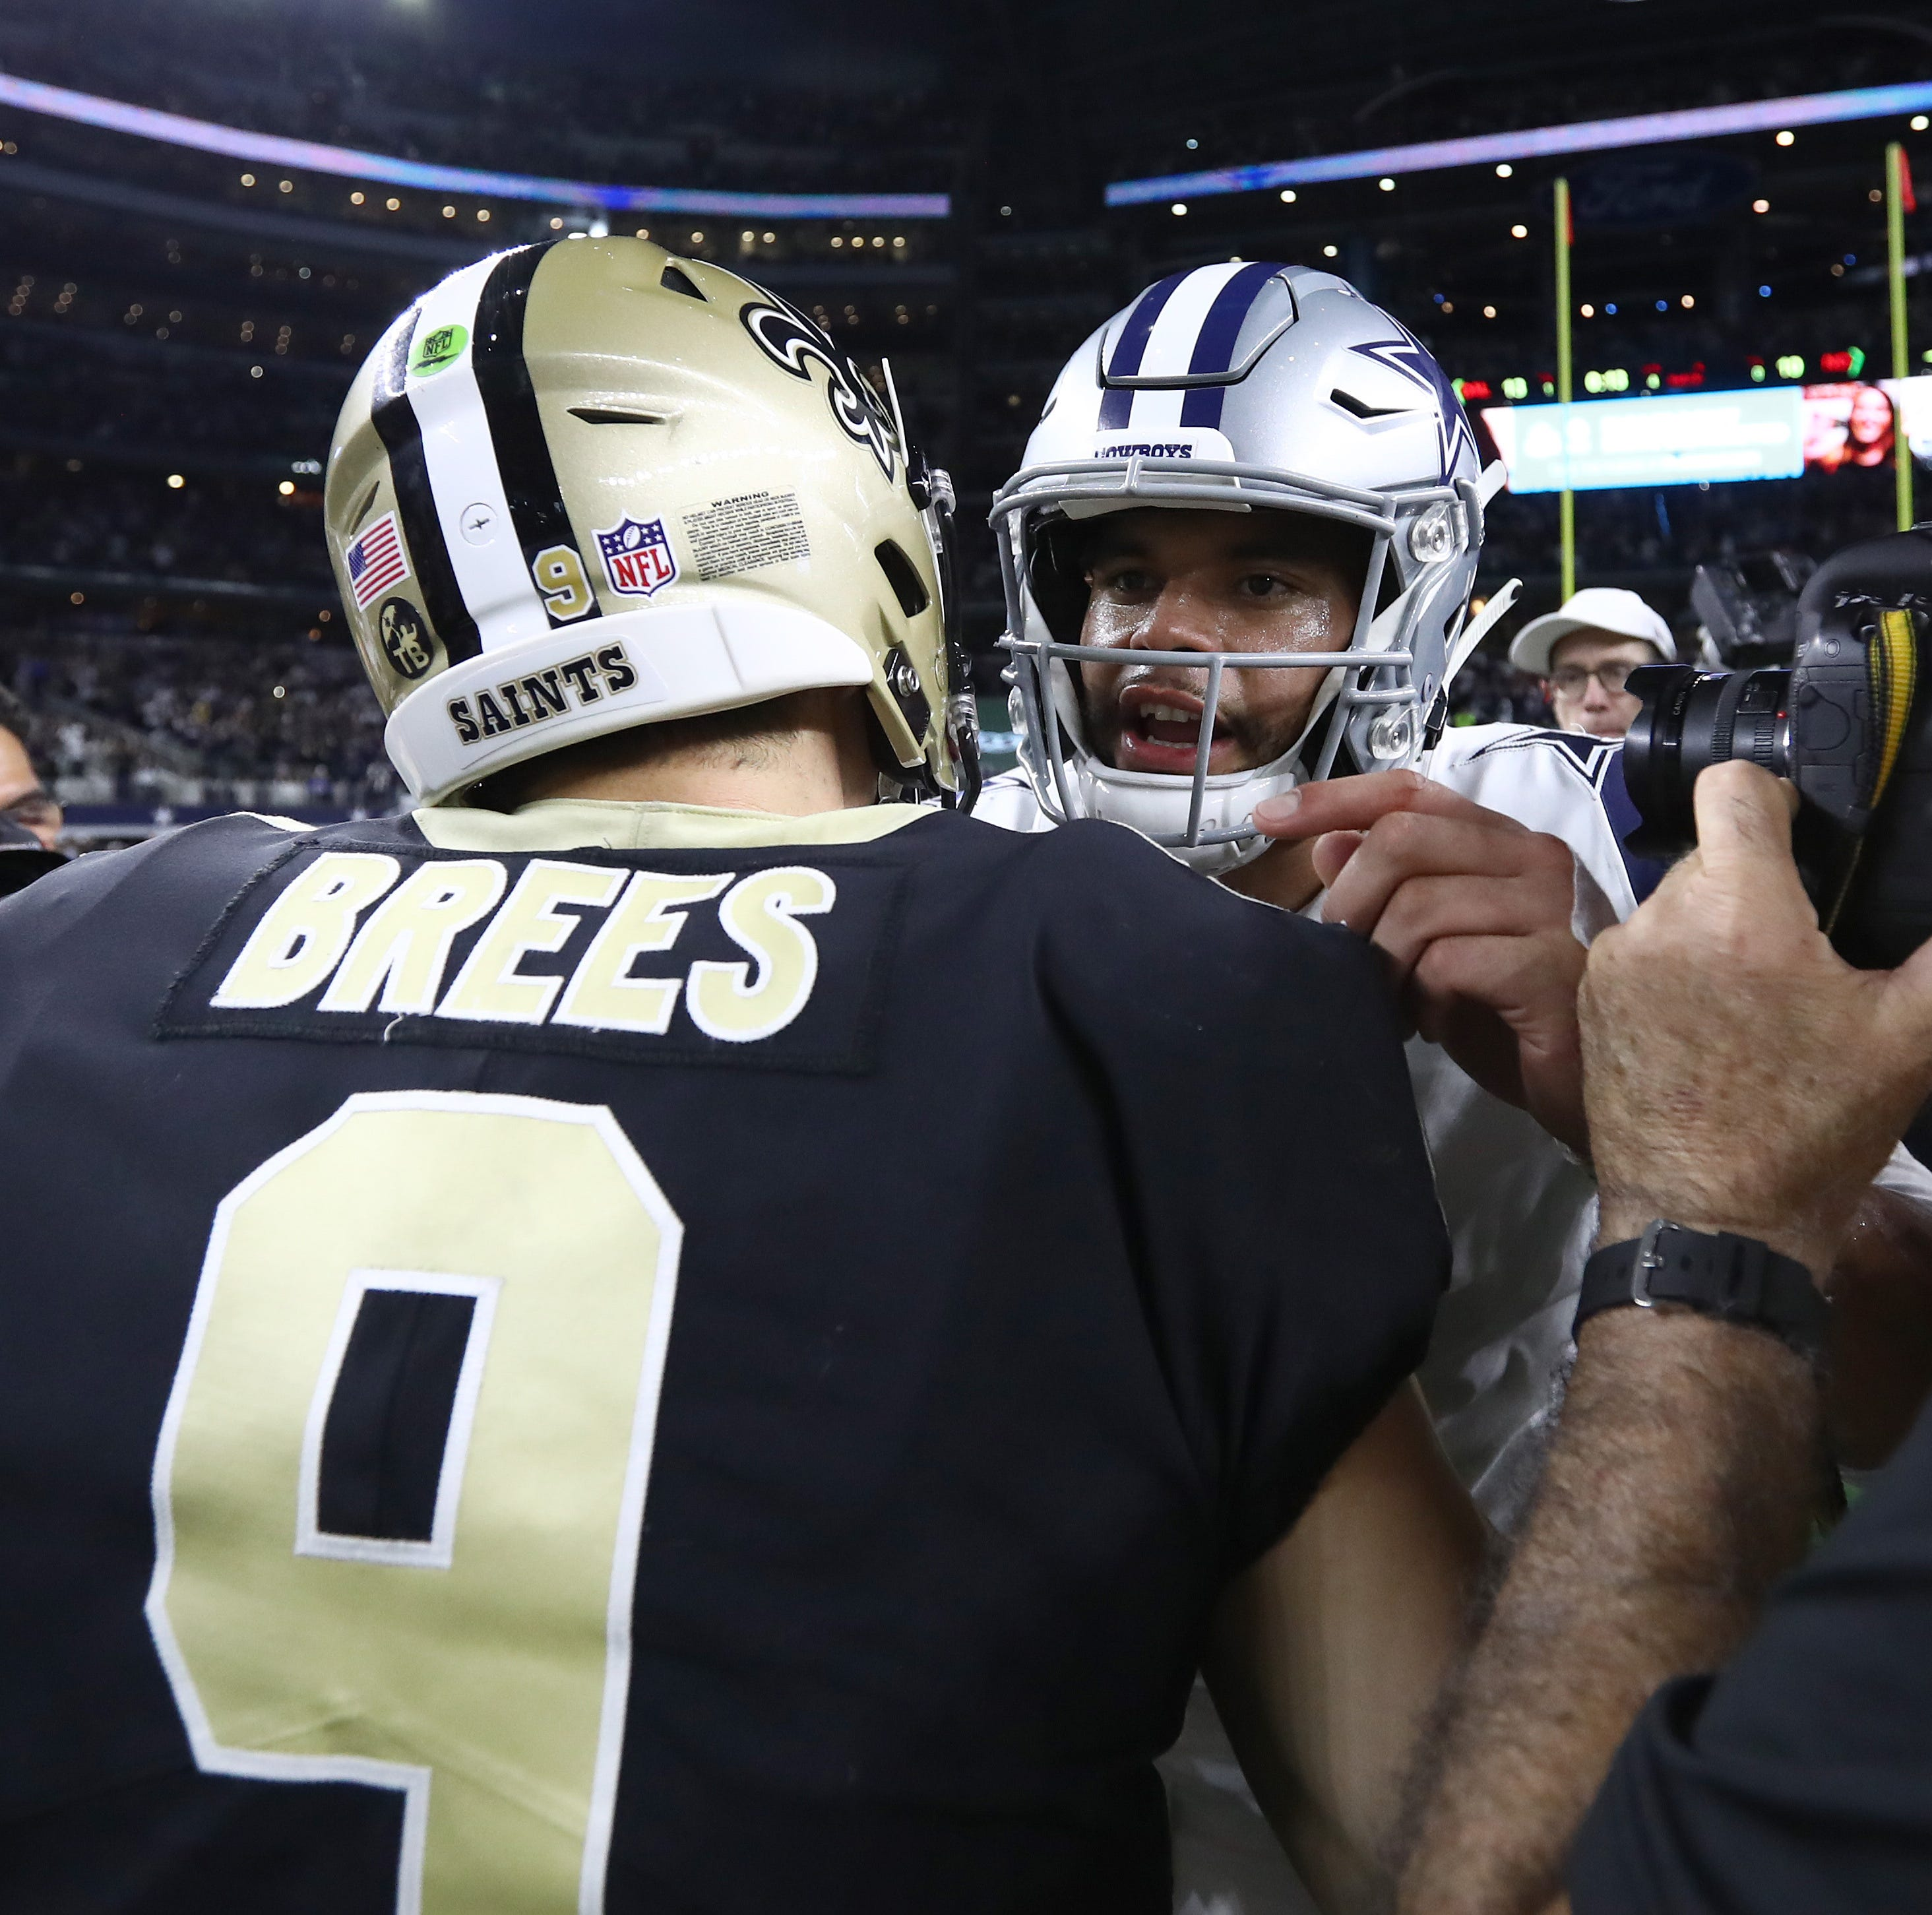 Dallas Cowboys quarterback Dak Prescott (4) and New Orleans Saints quarterback Drew Brees will meet in the Superdome this season.